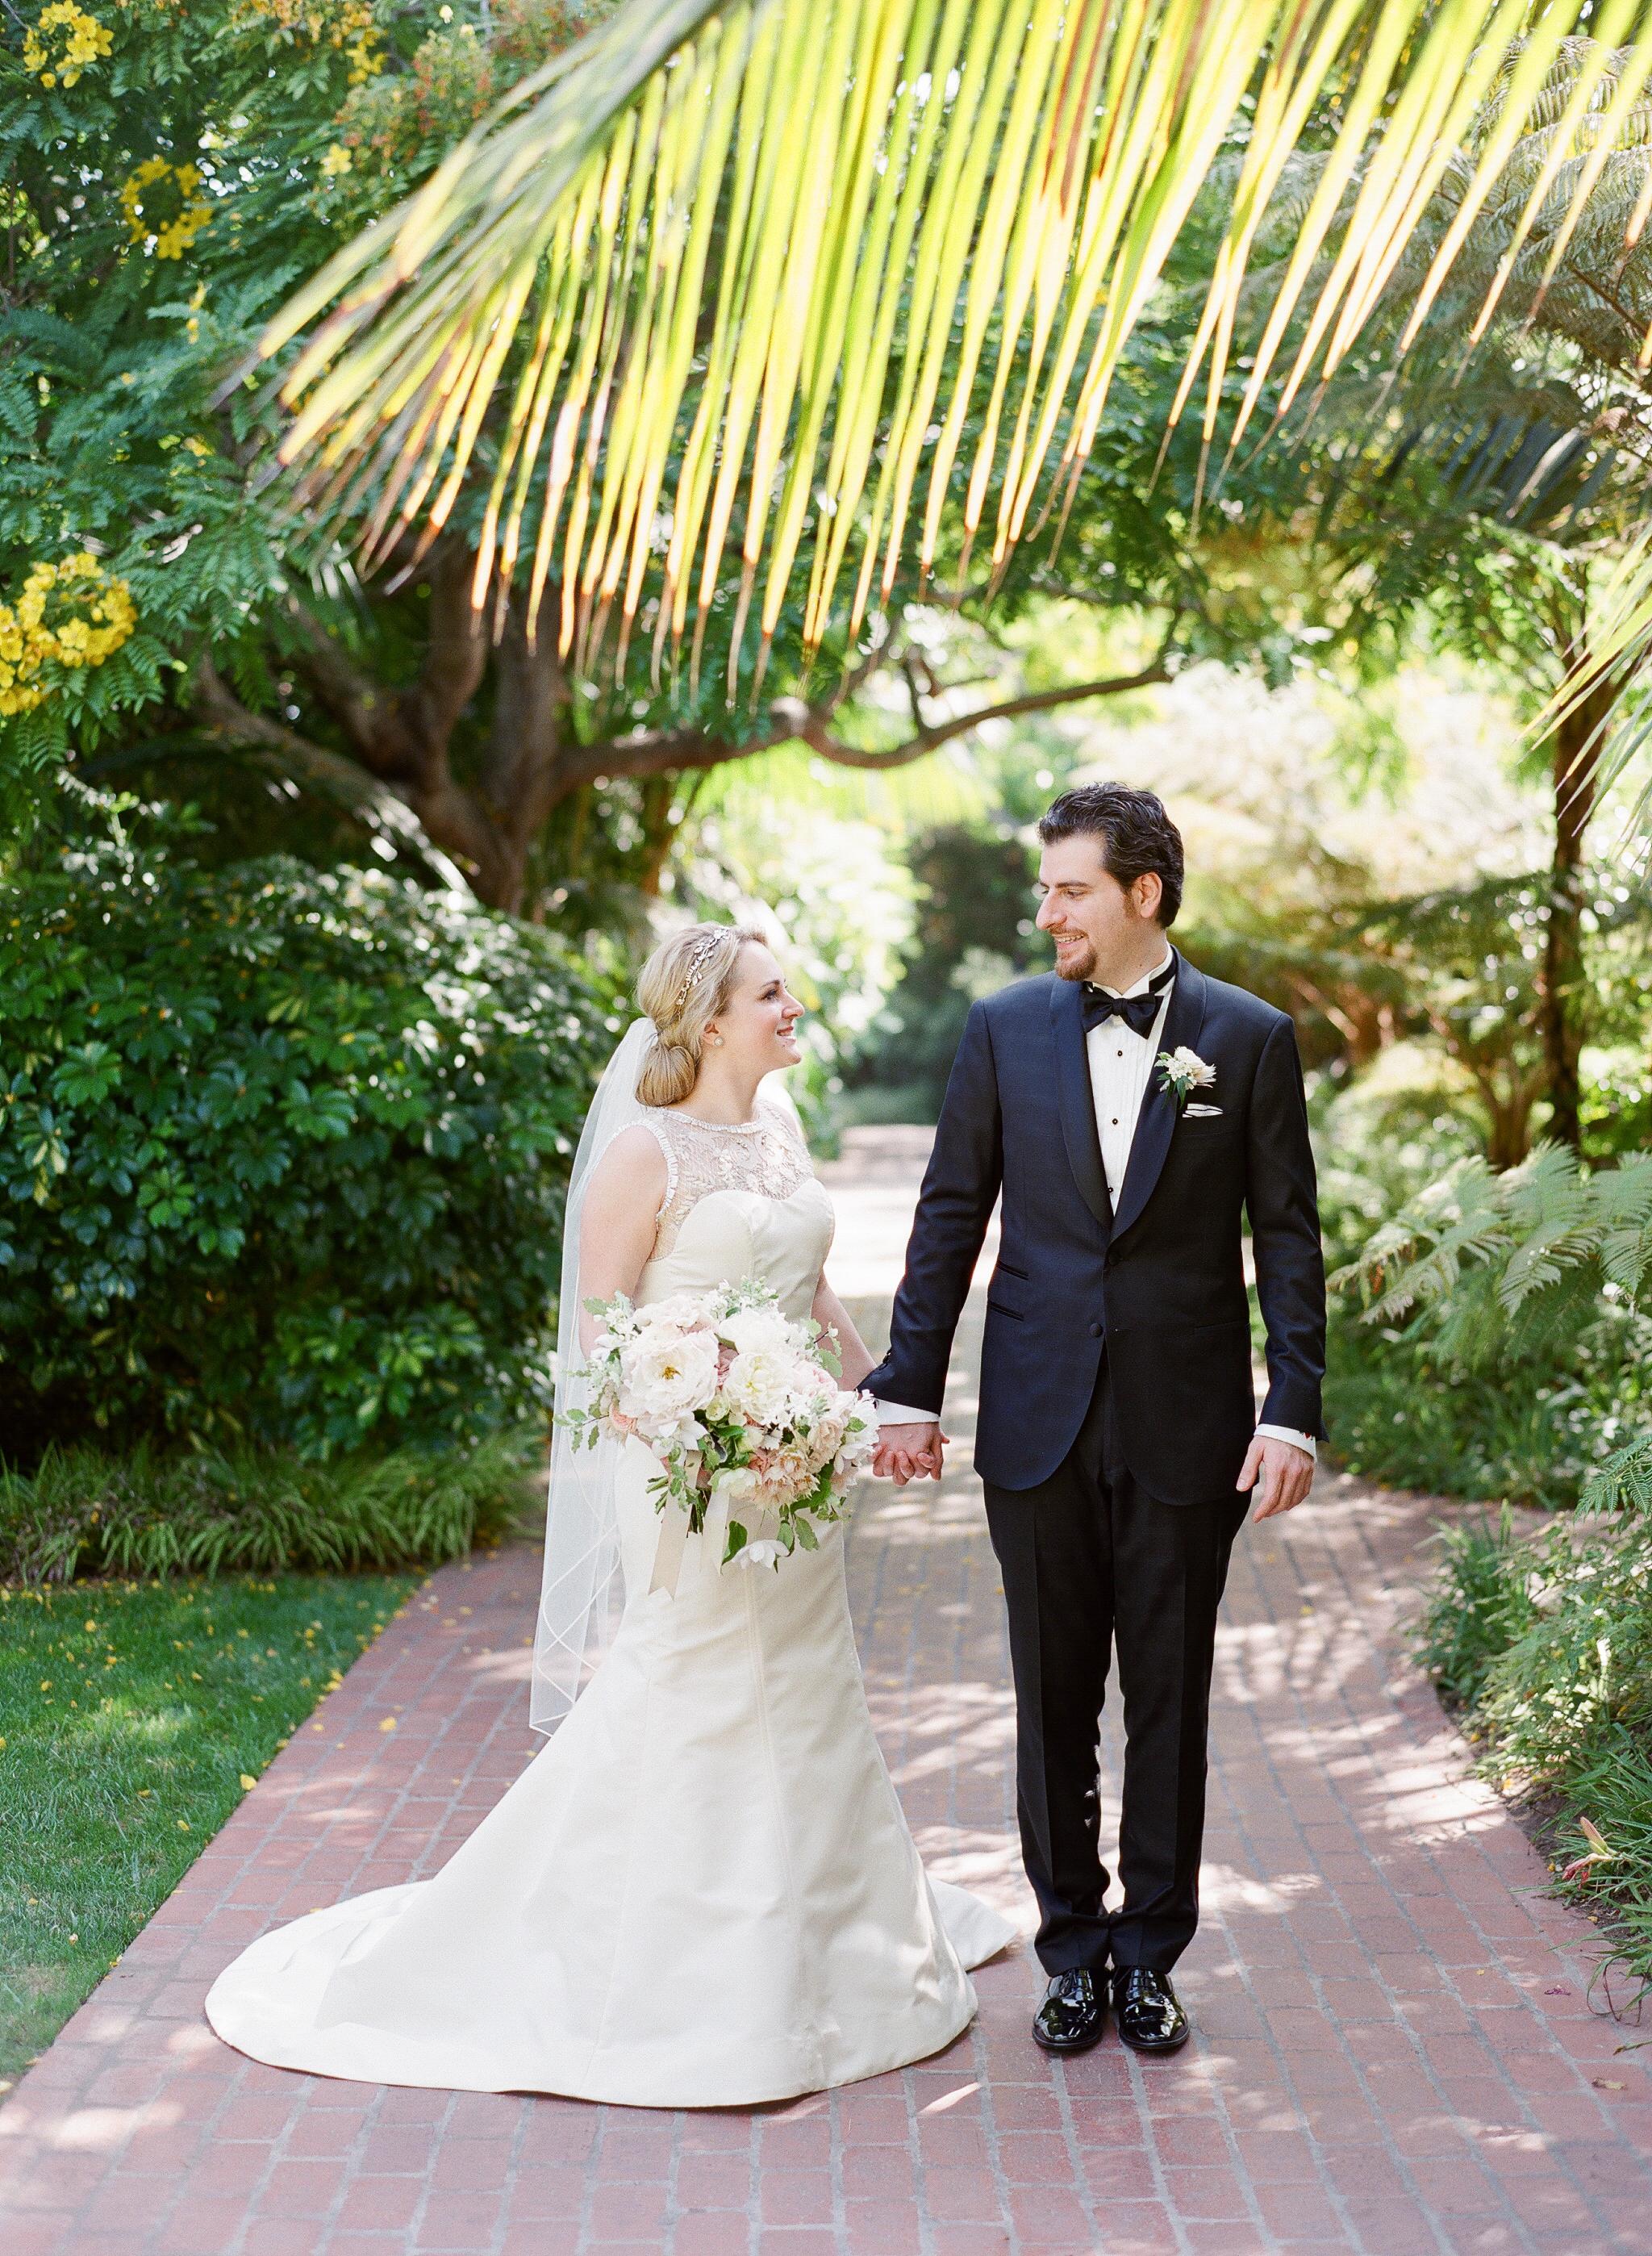 michellebeller.com   Michelle Beller Photography   Wedding at the Four Seasons Biltmore in Santa Barbara   Southern California Wedding Photographer